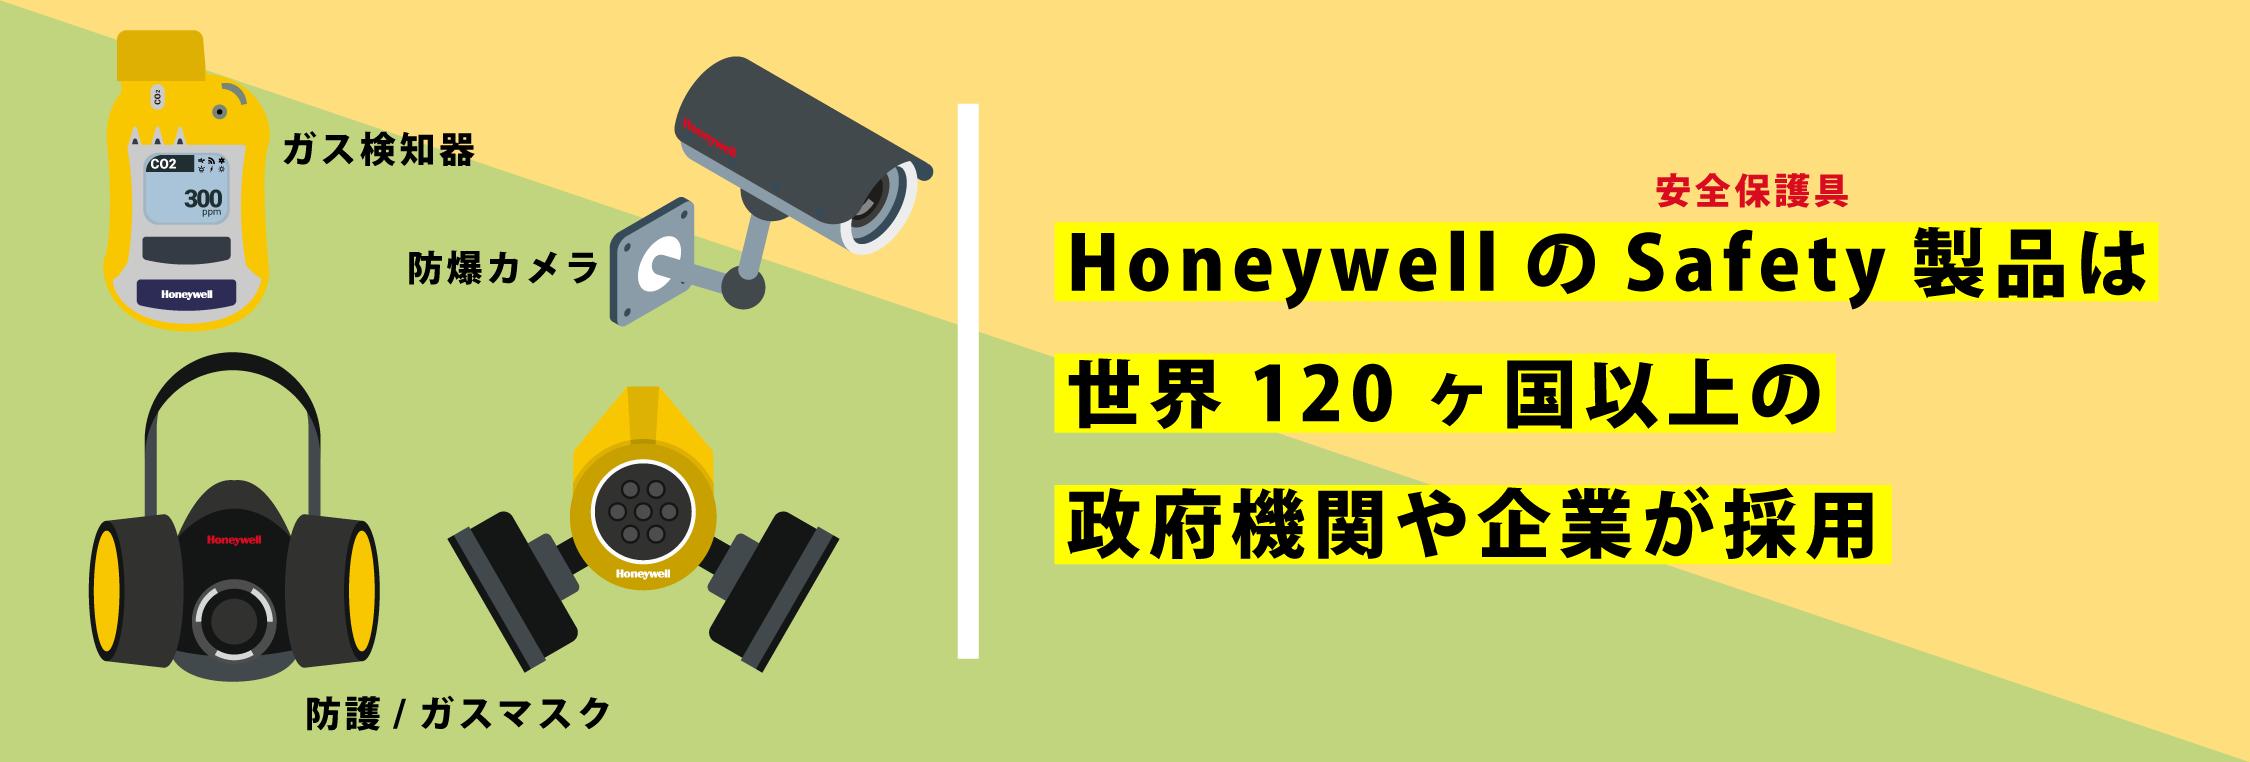 Honeywell防爆端末の歴史